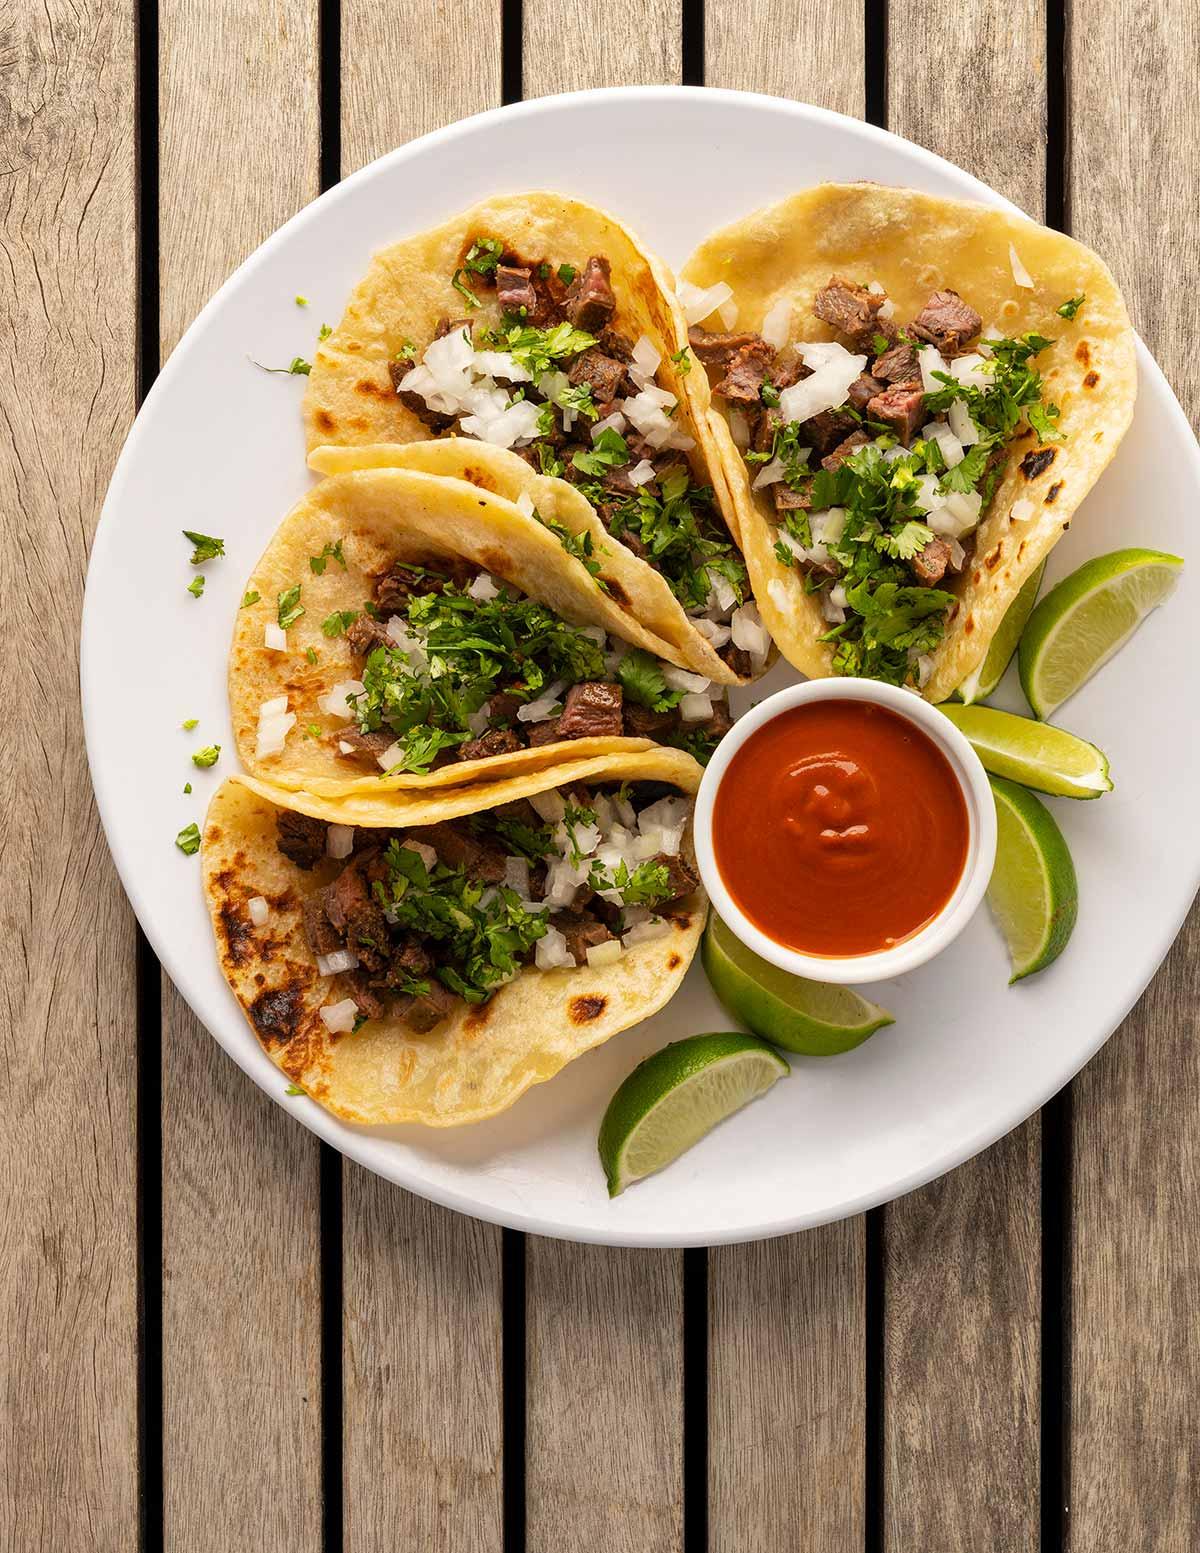 A plate of arrachera tacos with salsa